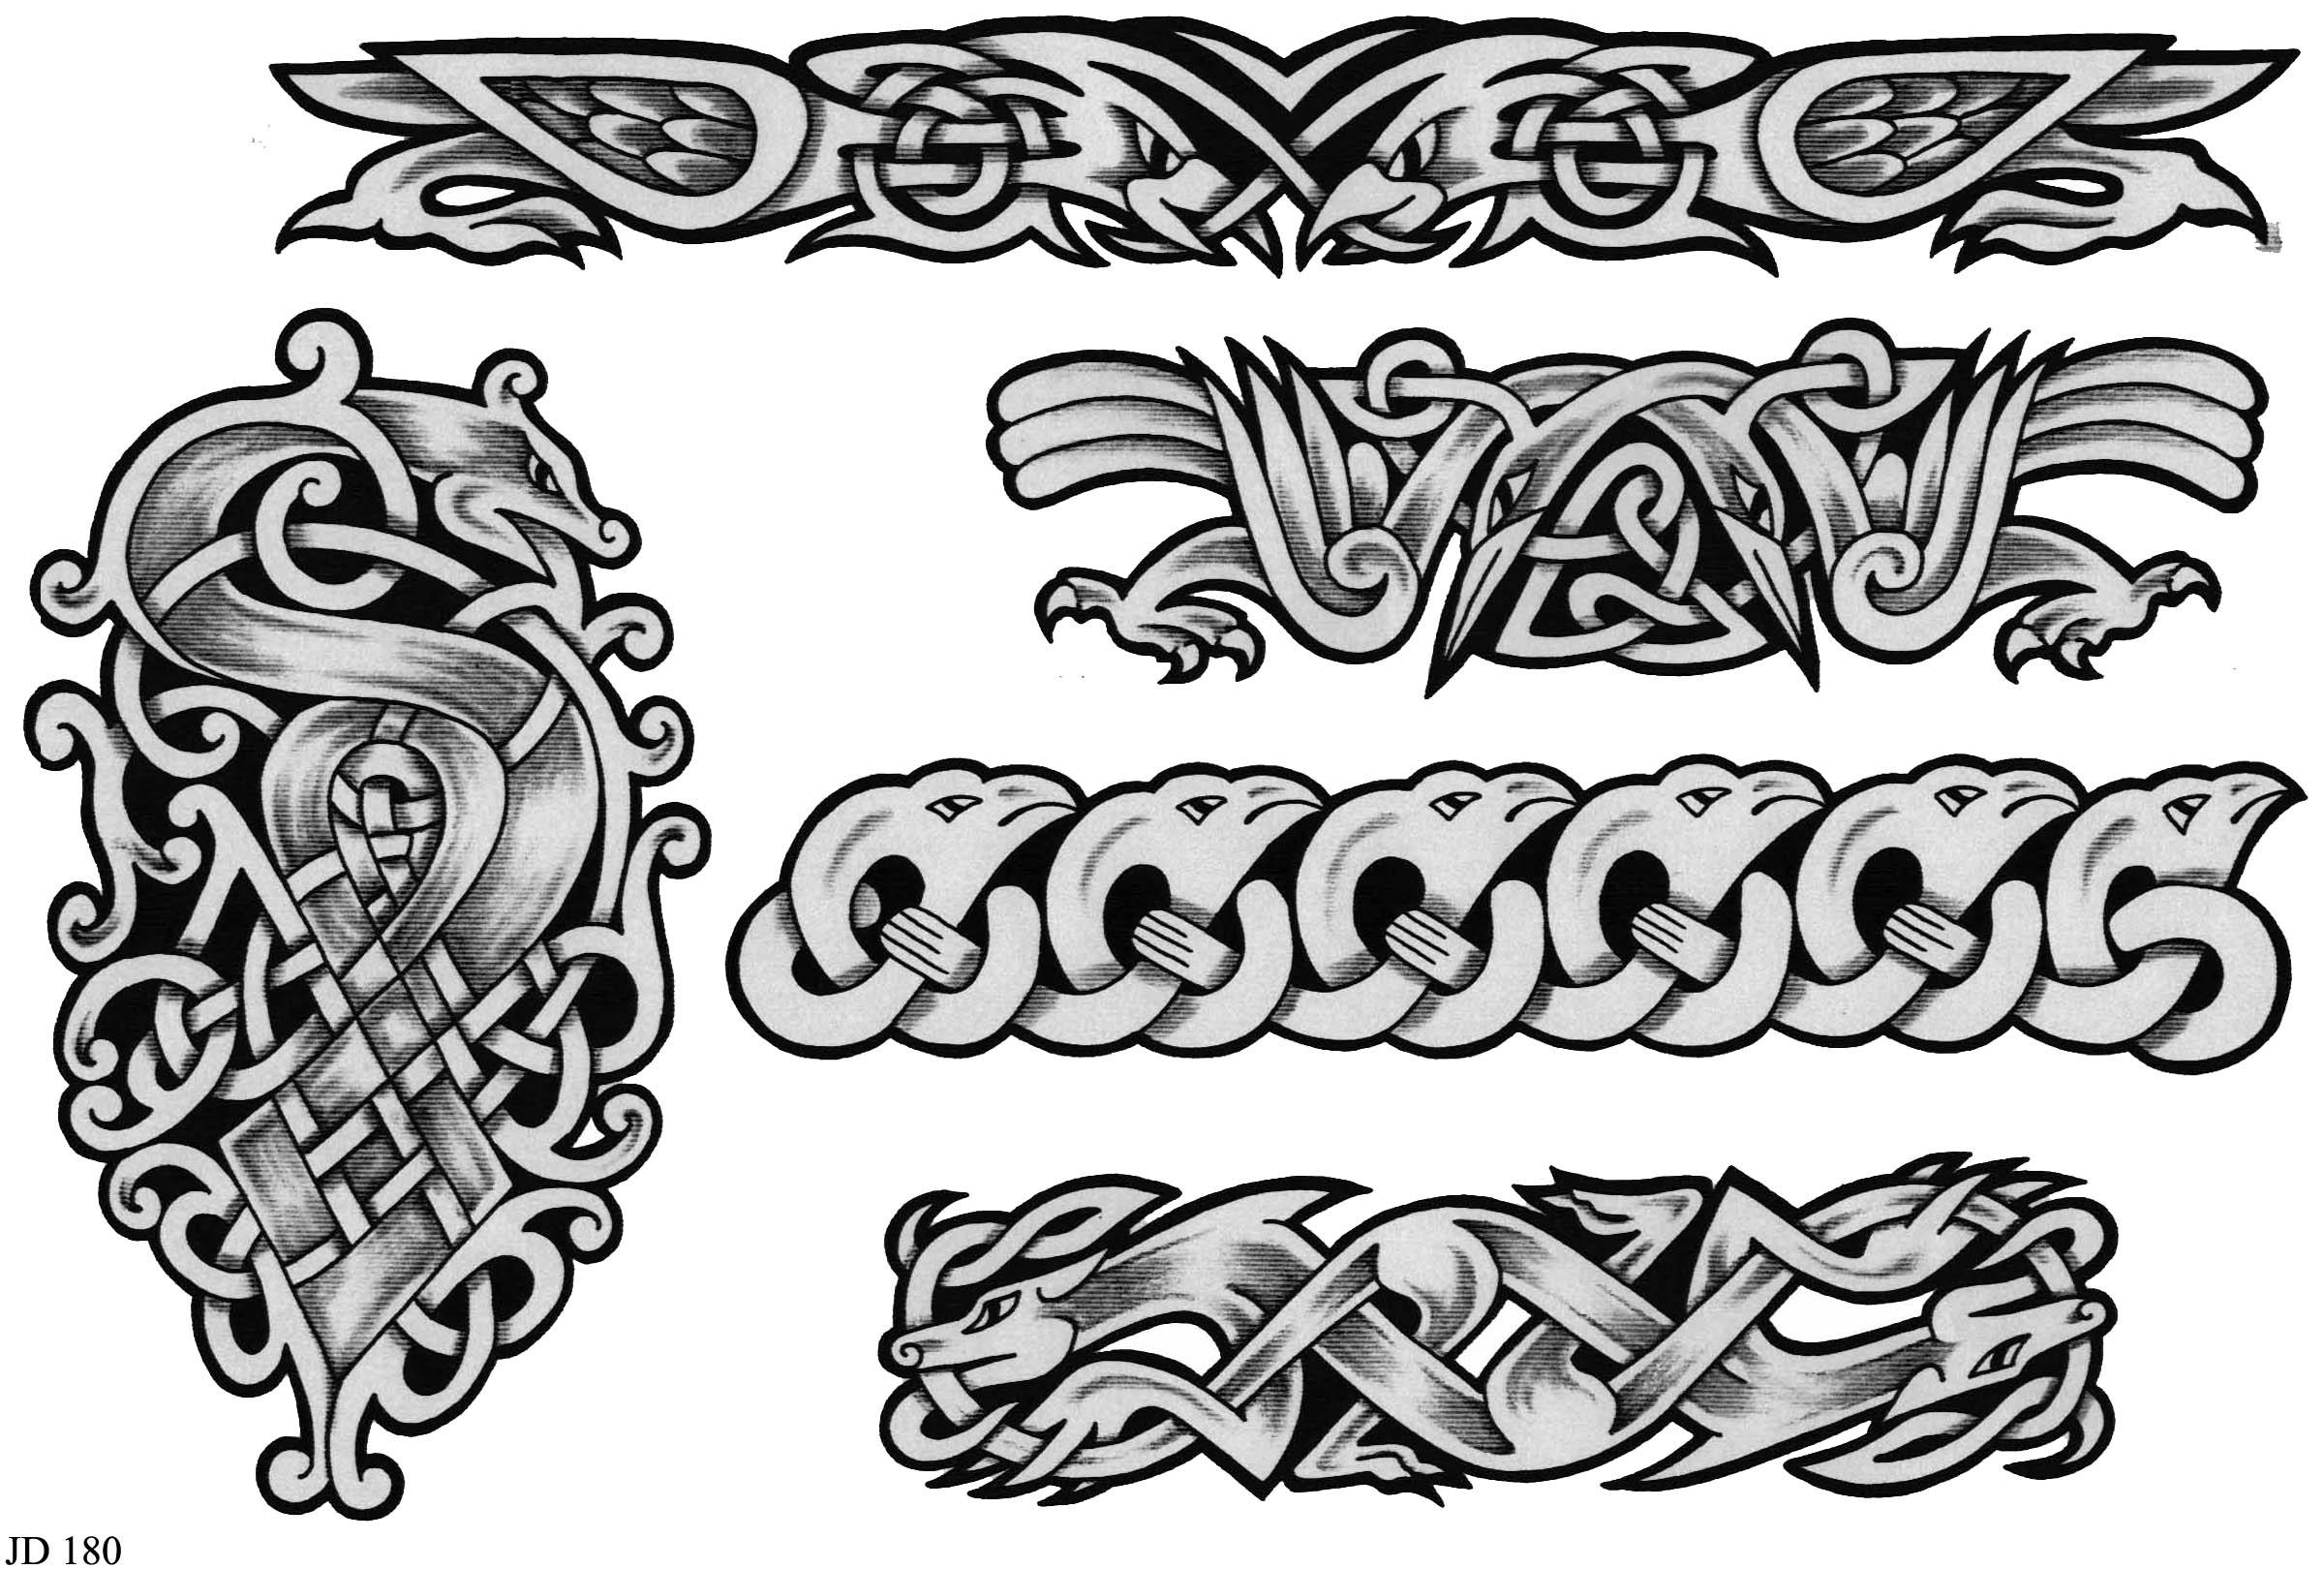 ideas tatoo topic tattoo designs celtic bands. Black Bedroom Furniture Sets. Home Design Ideas